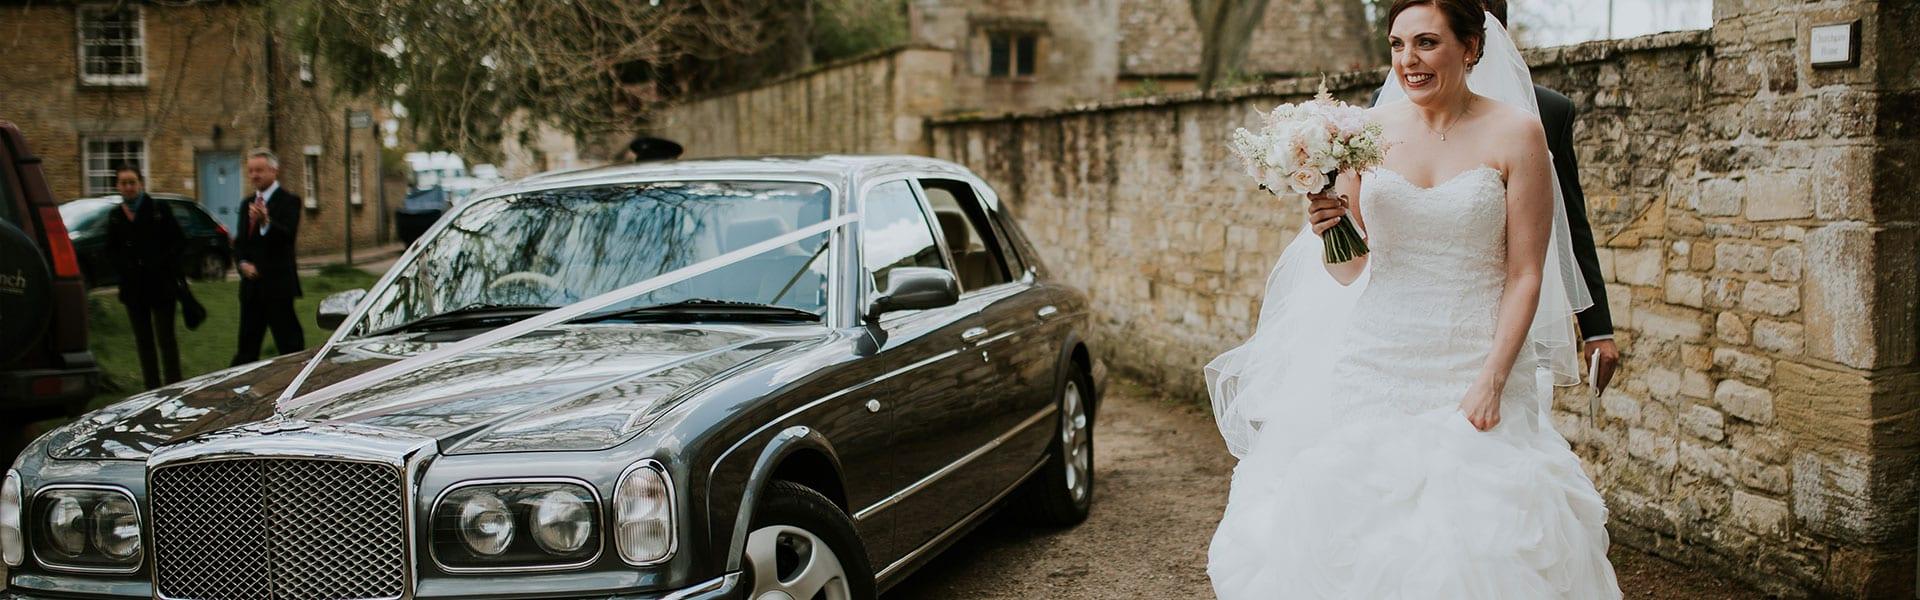 wedding-cars-oxfordshire